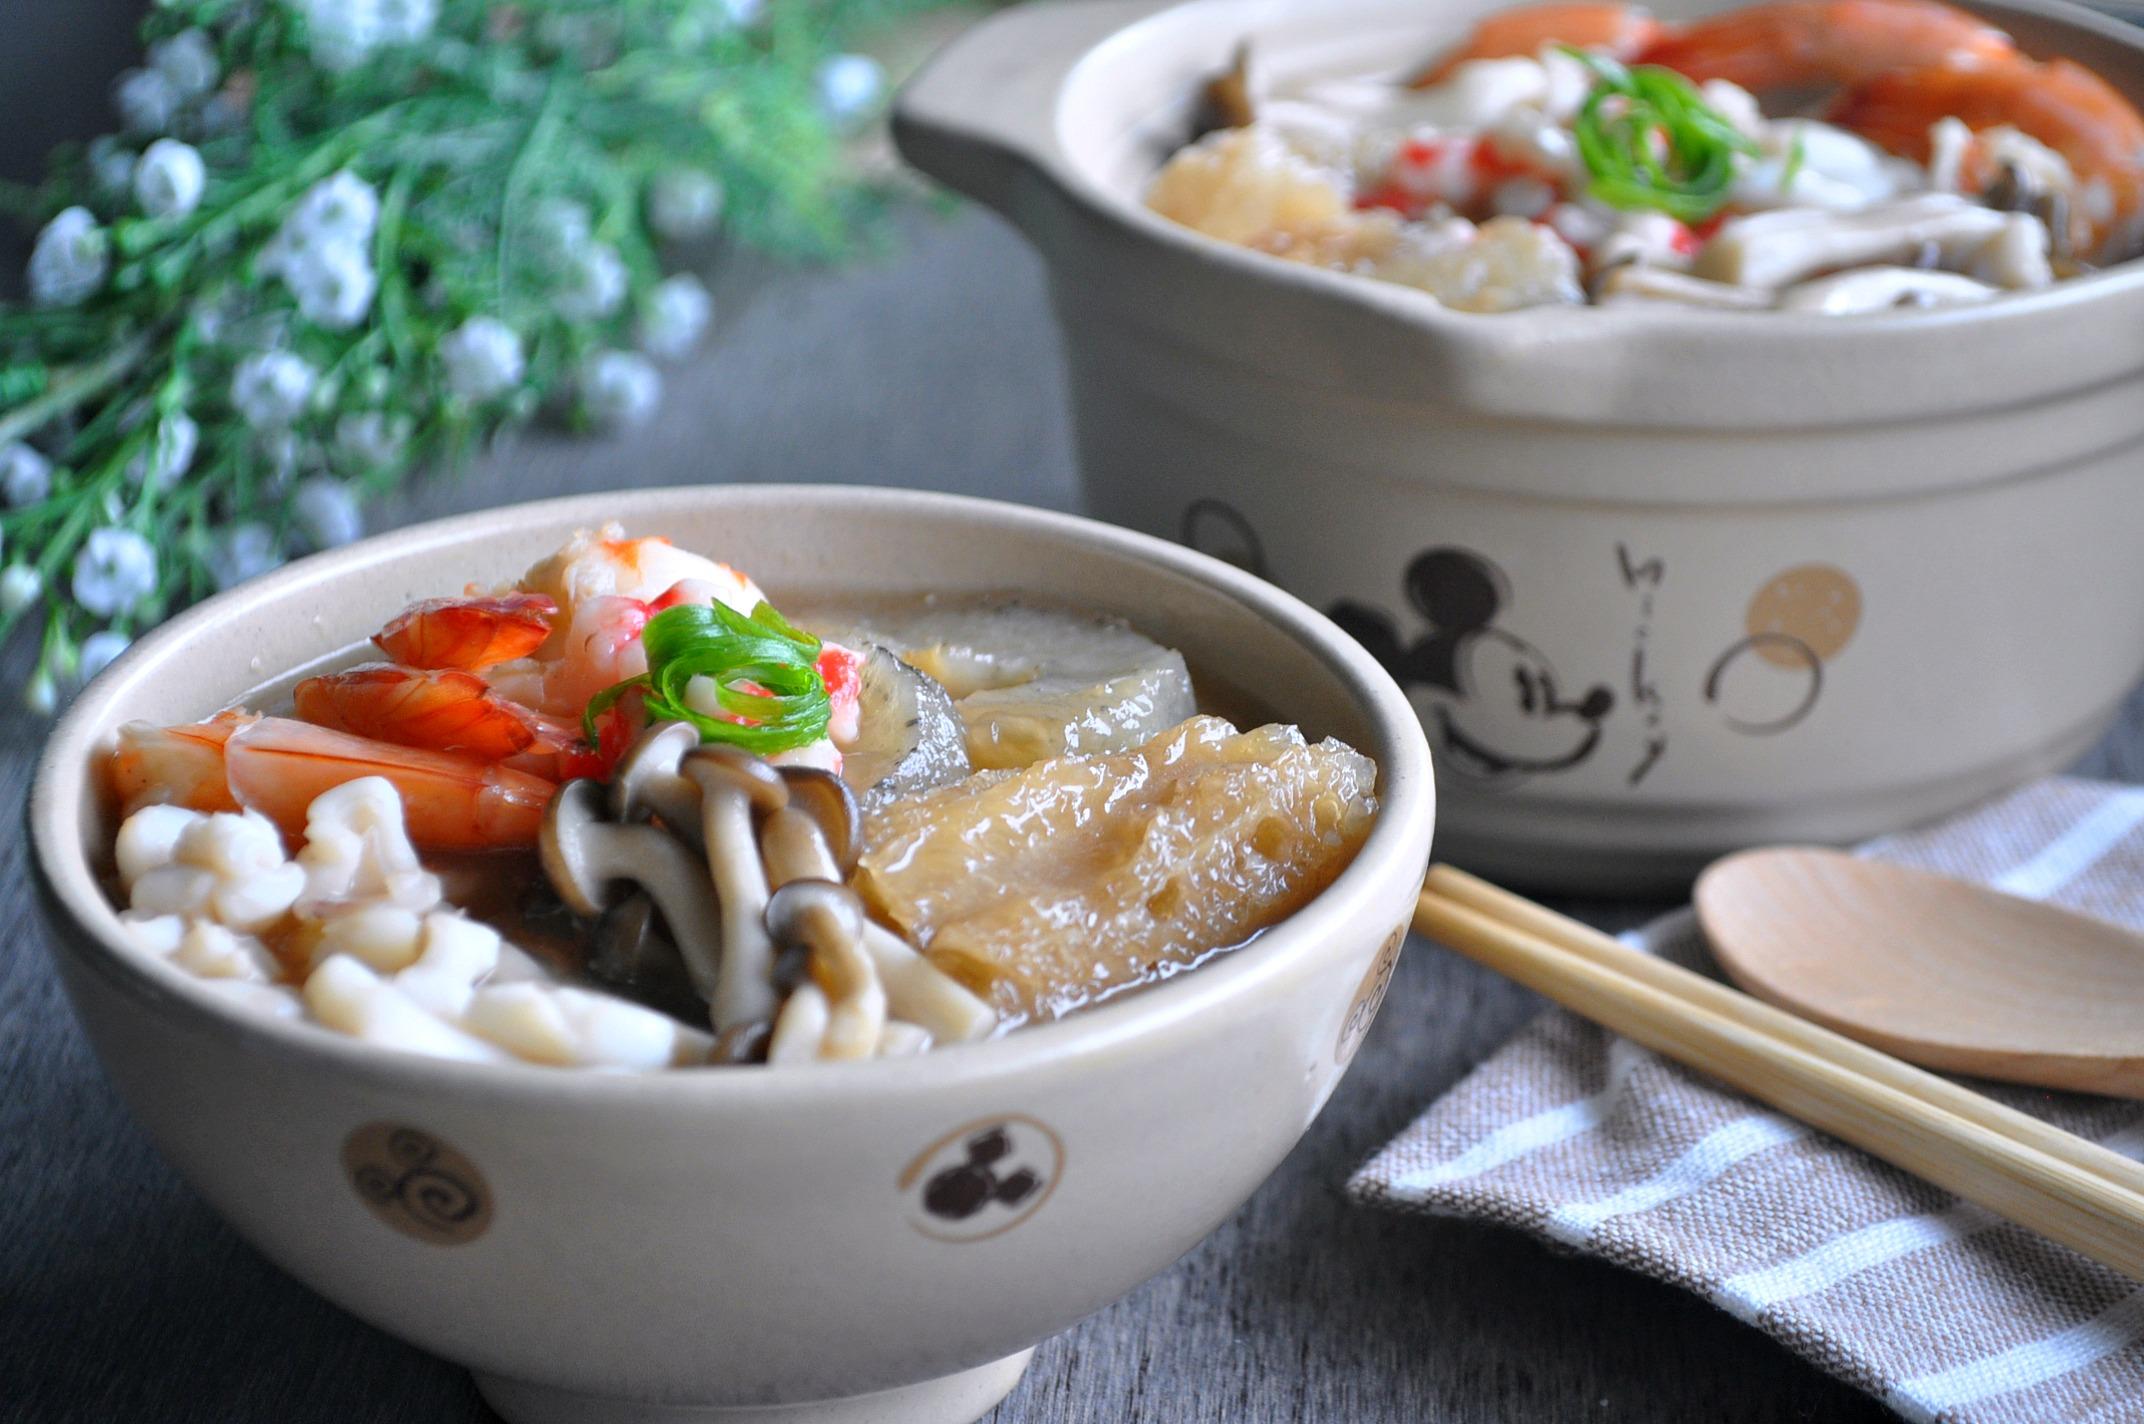 Fish Maw & Sea Cucumber Seafood Broth 什锦鱼鳔海参羹 - Eat What ...